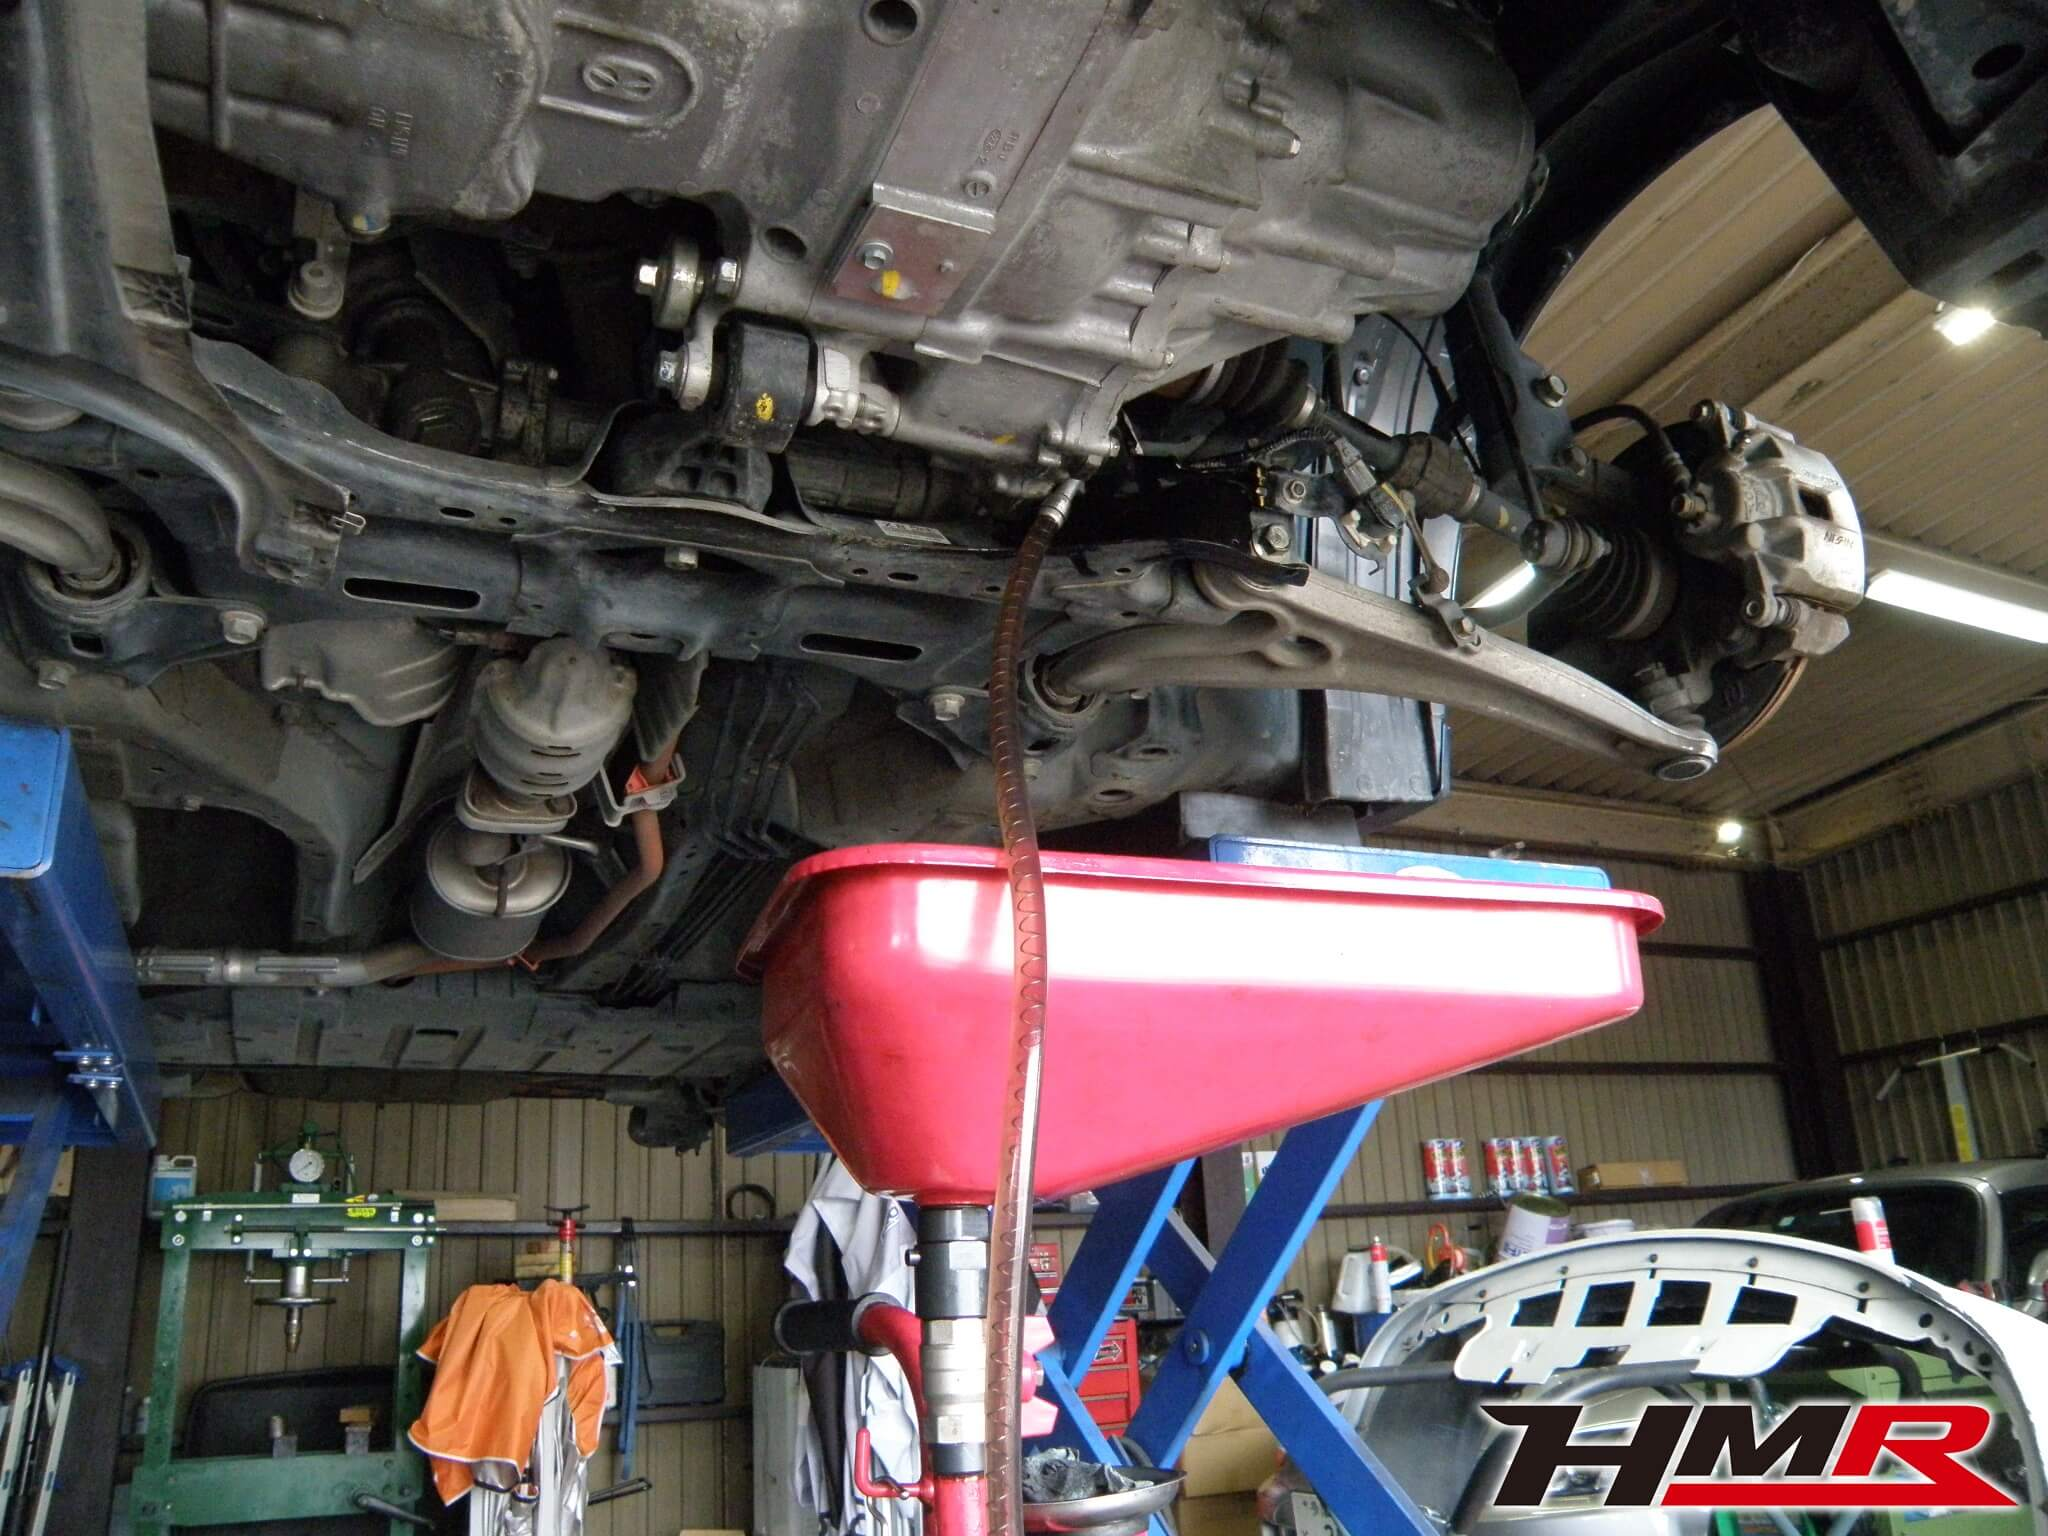 CR-Z 納車前整備 トランスミッションオイル交換